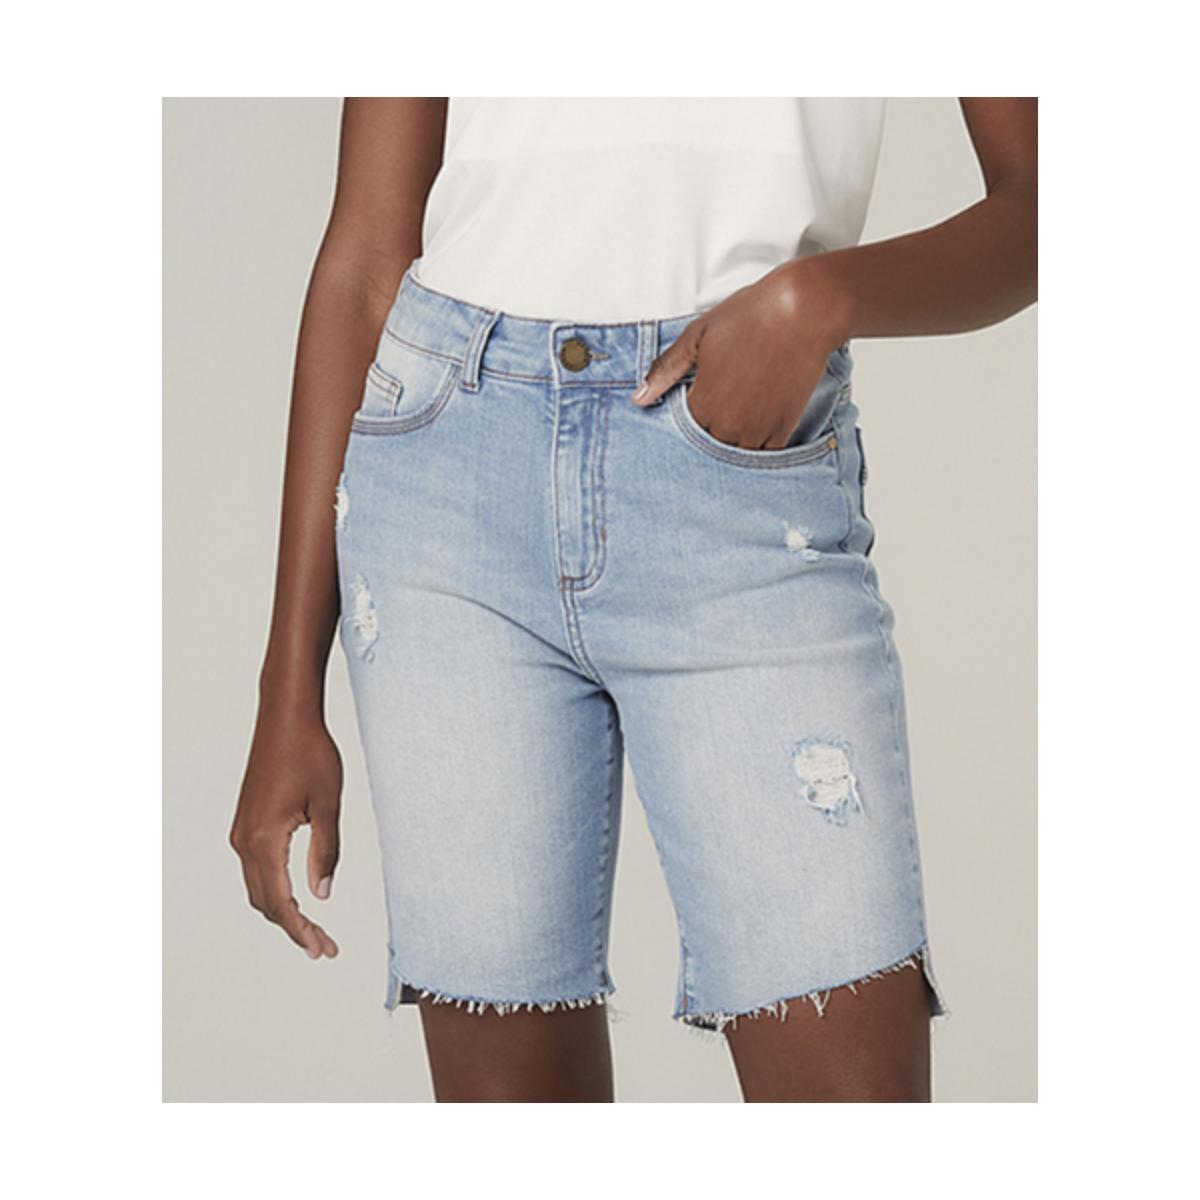 Bermuda Feminina Dzarm Zbl8 1bsn Jeans